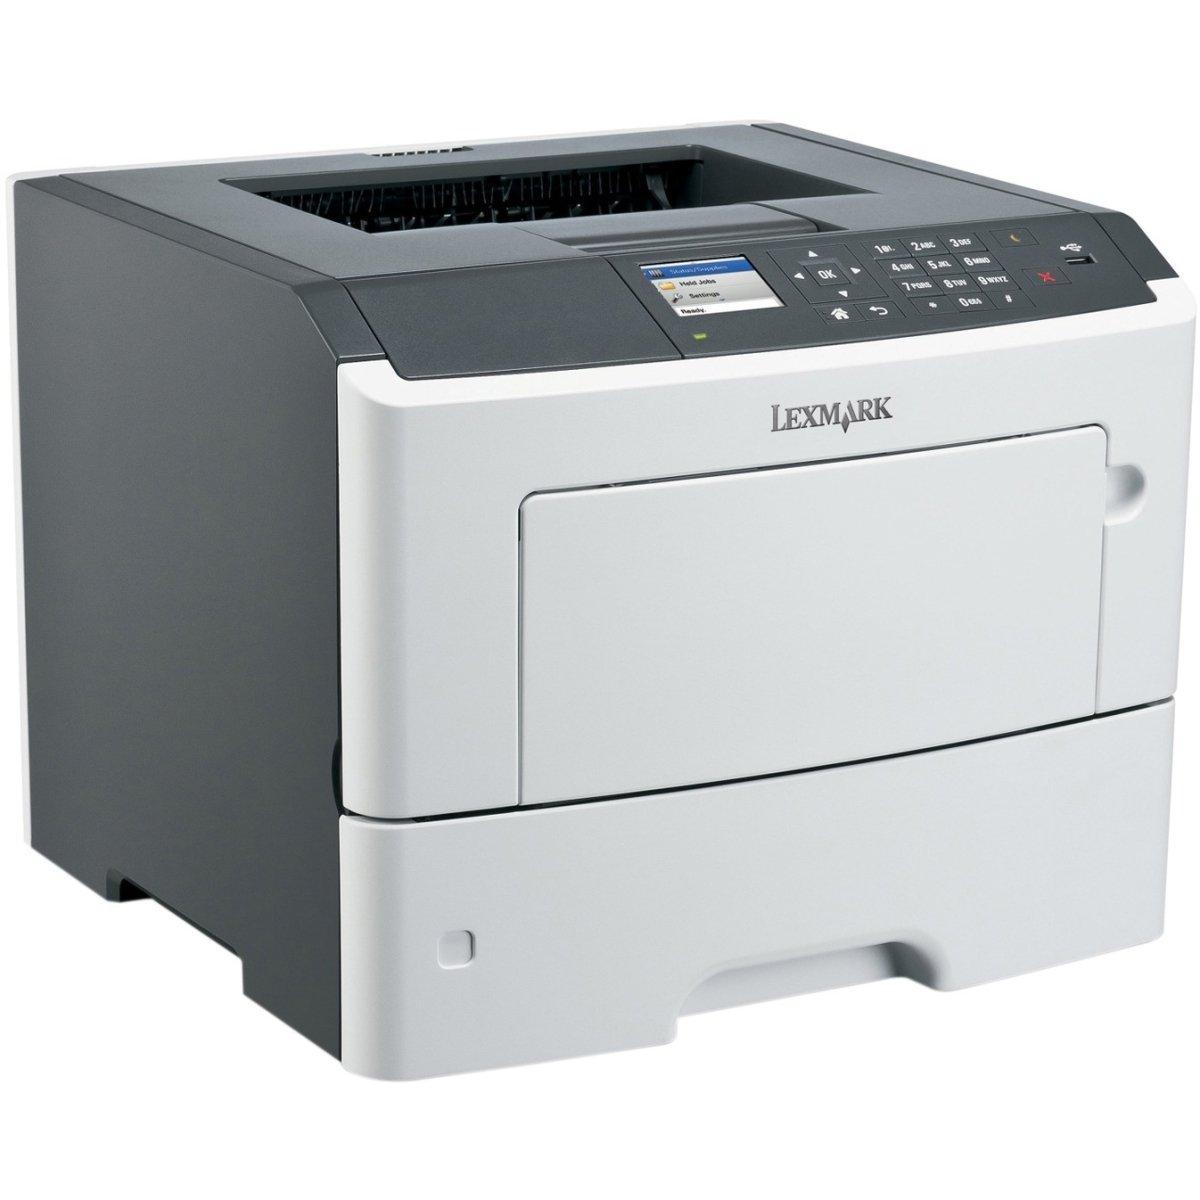 Lexmark 35ST414 MS610DN - LASER PRINTER - MONOCHROME - LASER - BLACK: 50 PPM - 1200 DPI X 1200 D